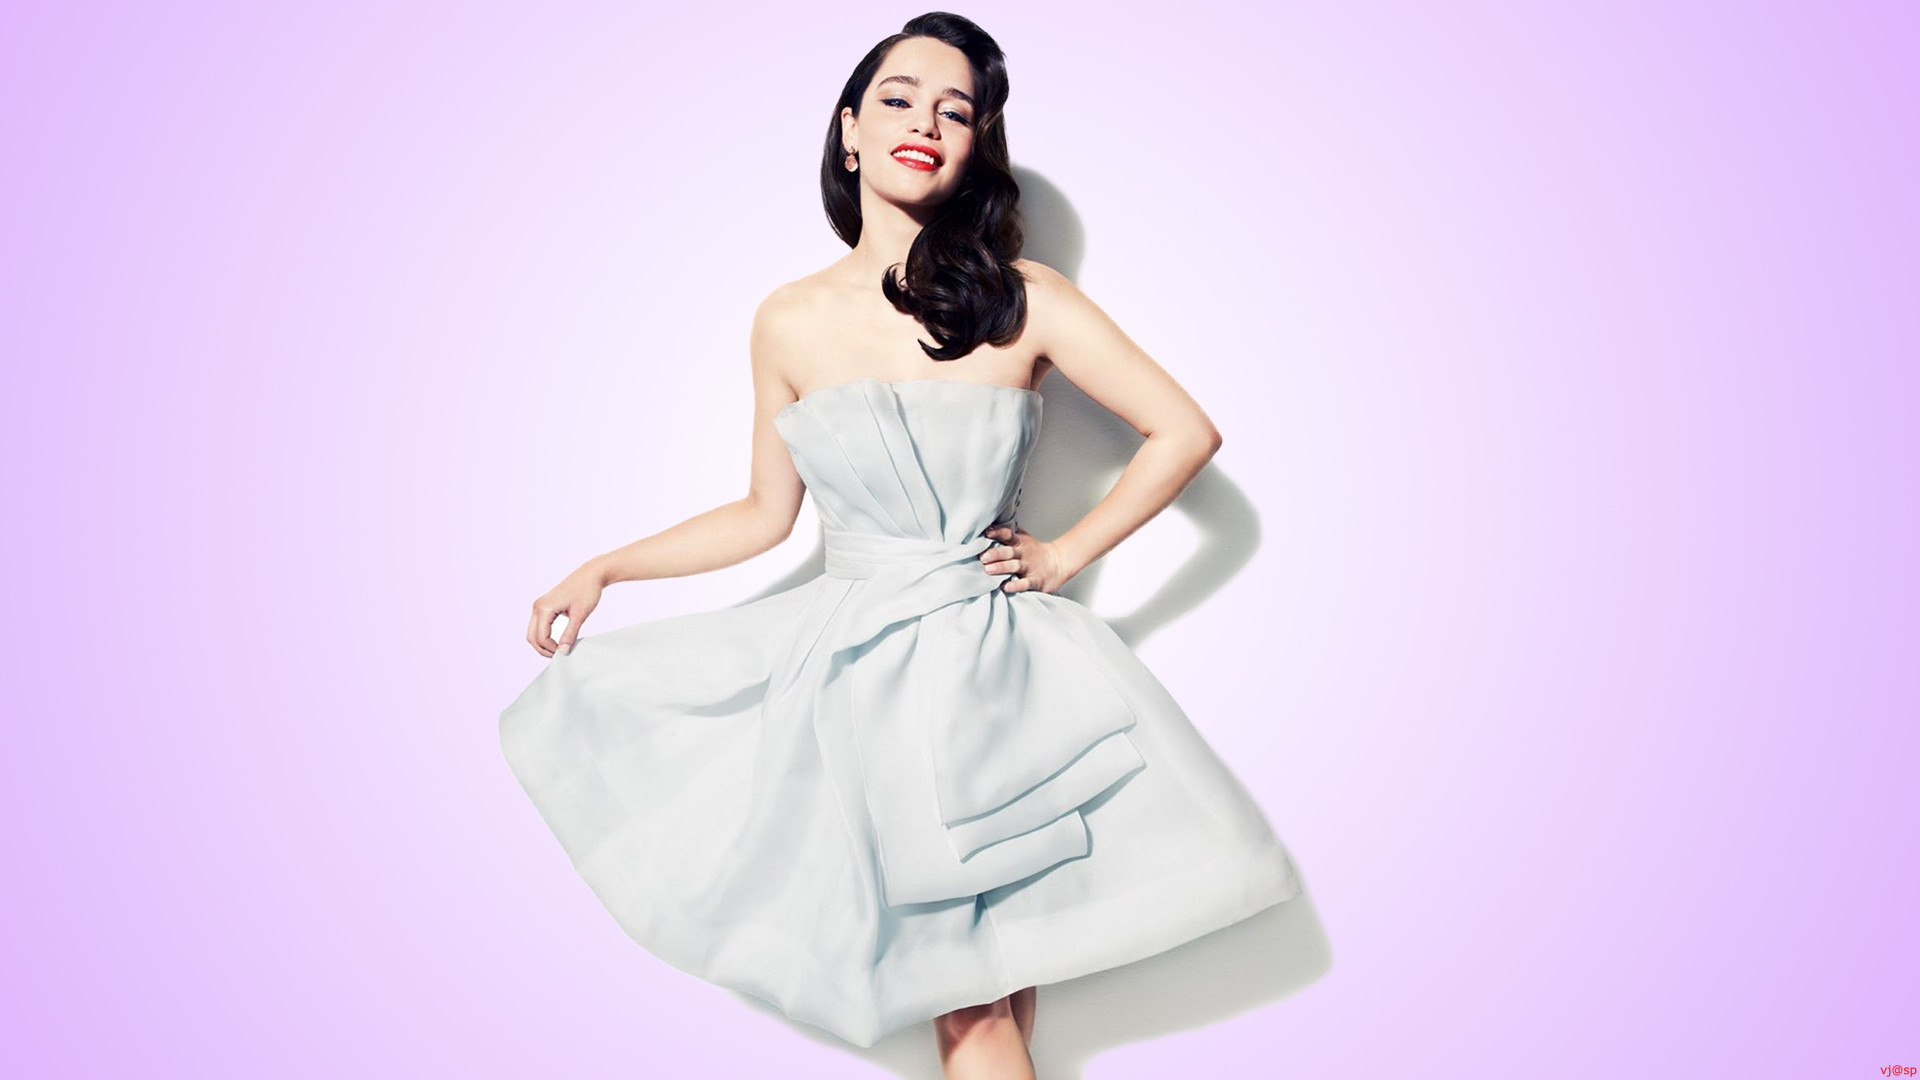 Emilia Clarke Wallpaper 1080p 5